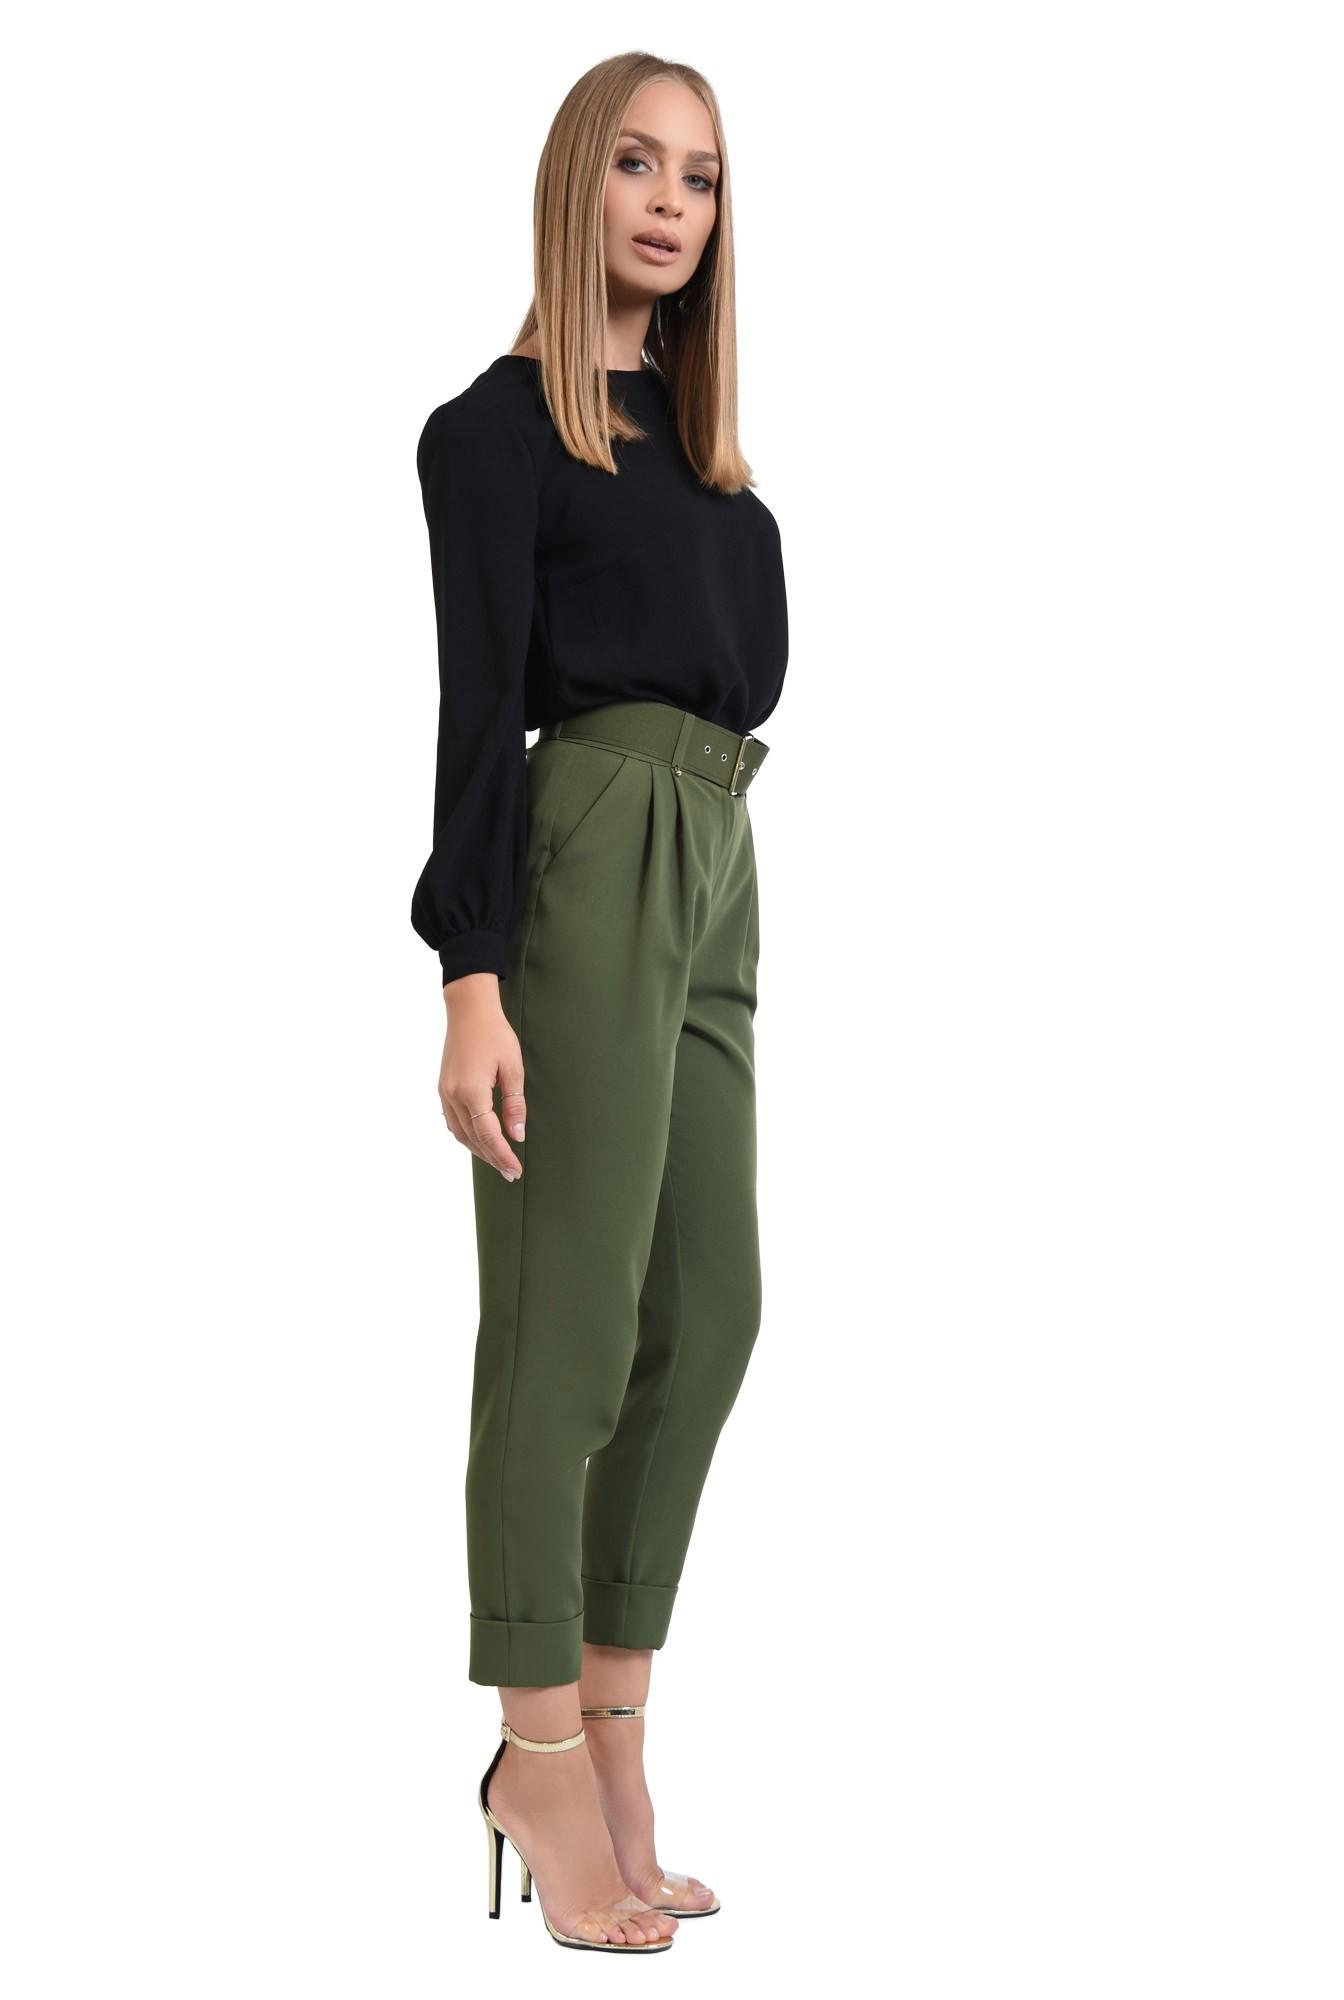 0 - pantaloni de dama, pantaloni online, verde kaki, curea, mansete